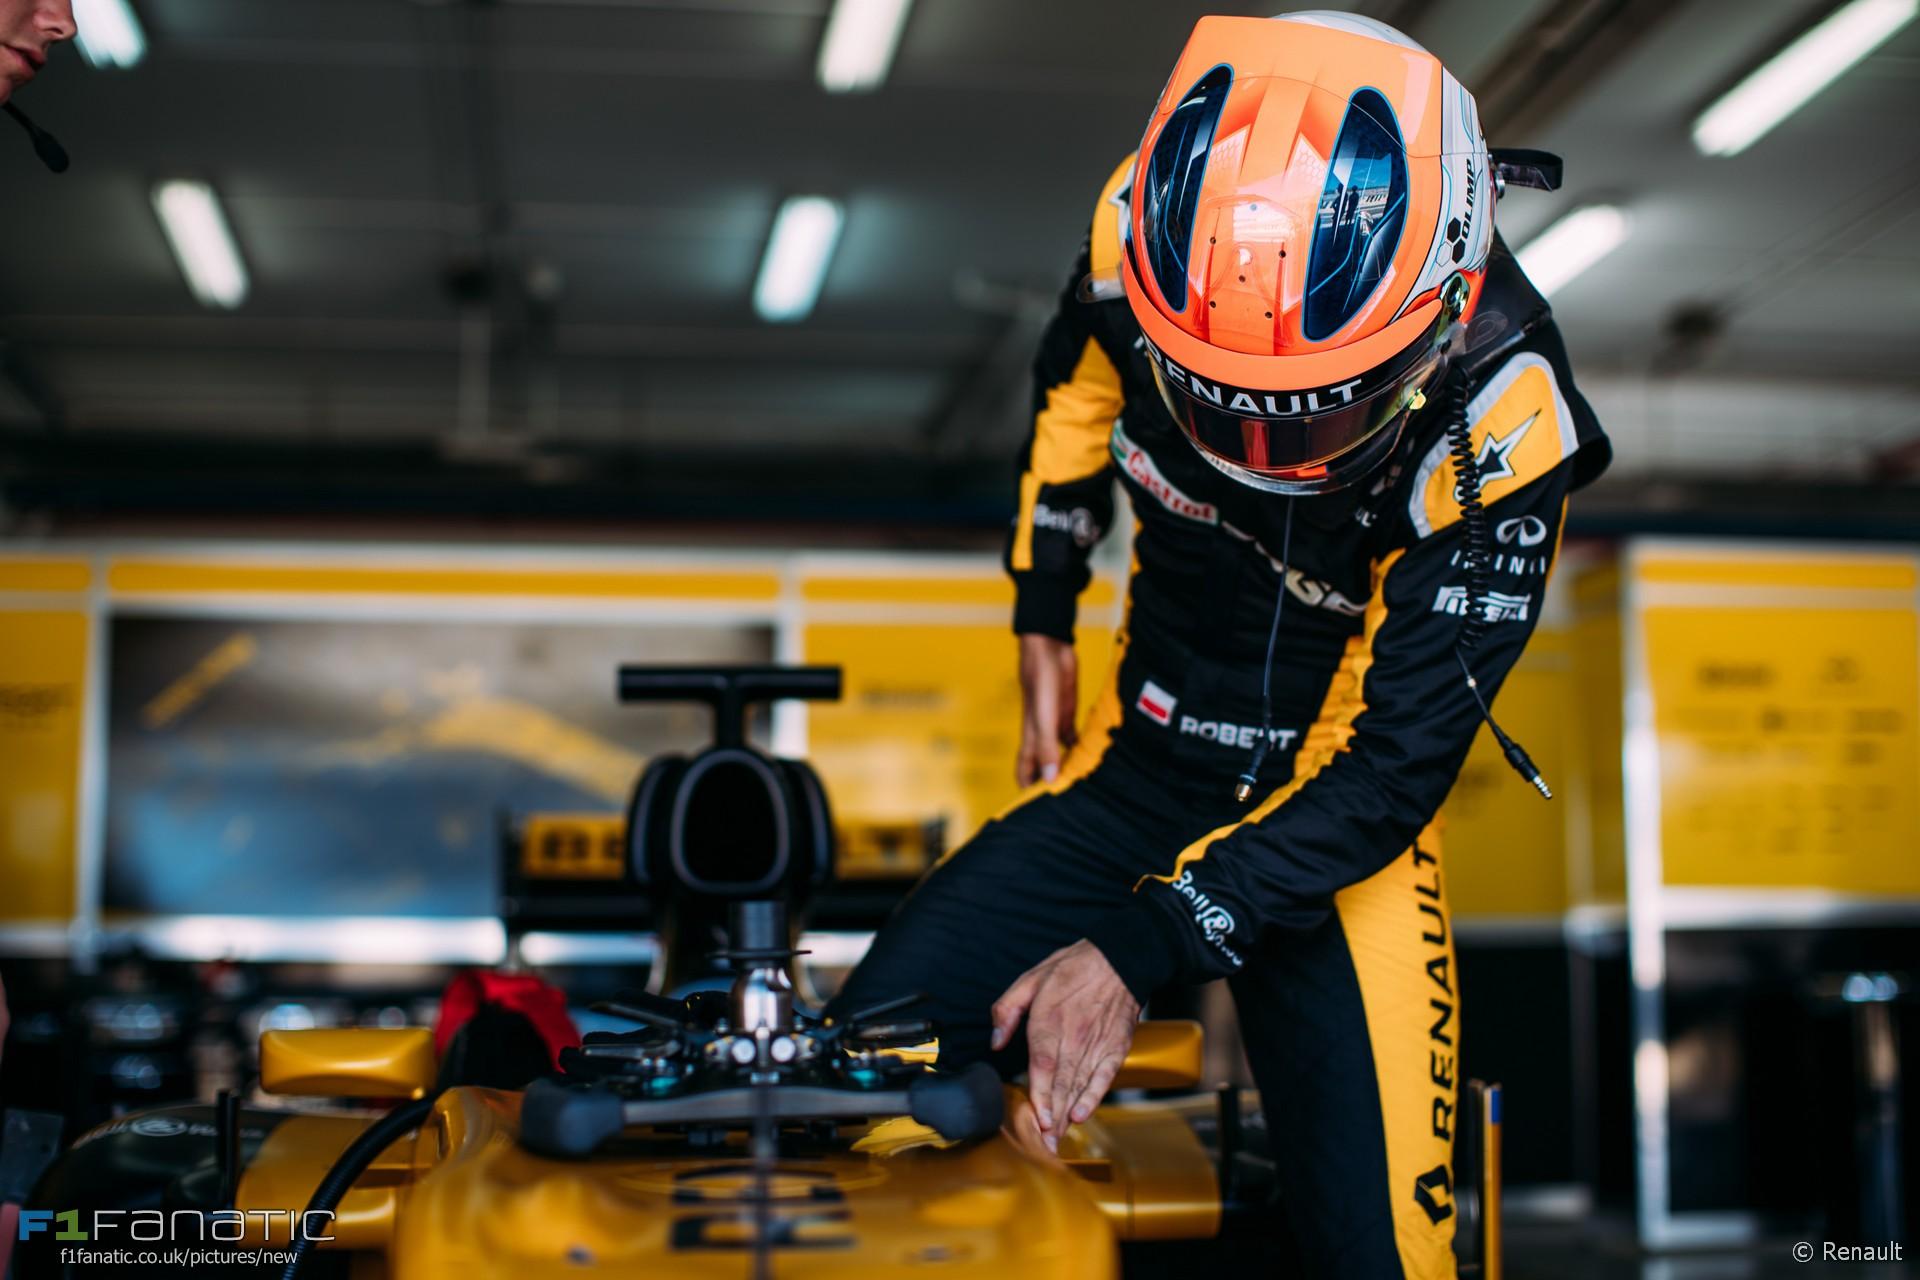 Robert Kubica Renault Valencia 2017 183 F1 Fanatic